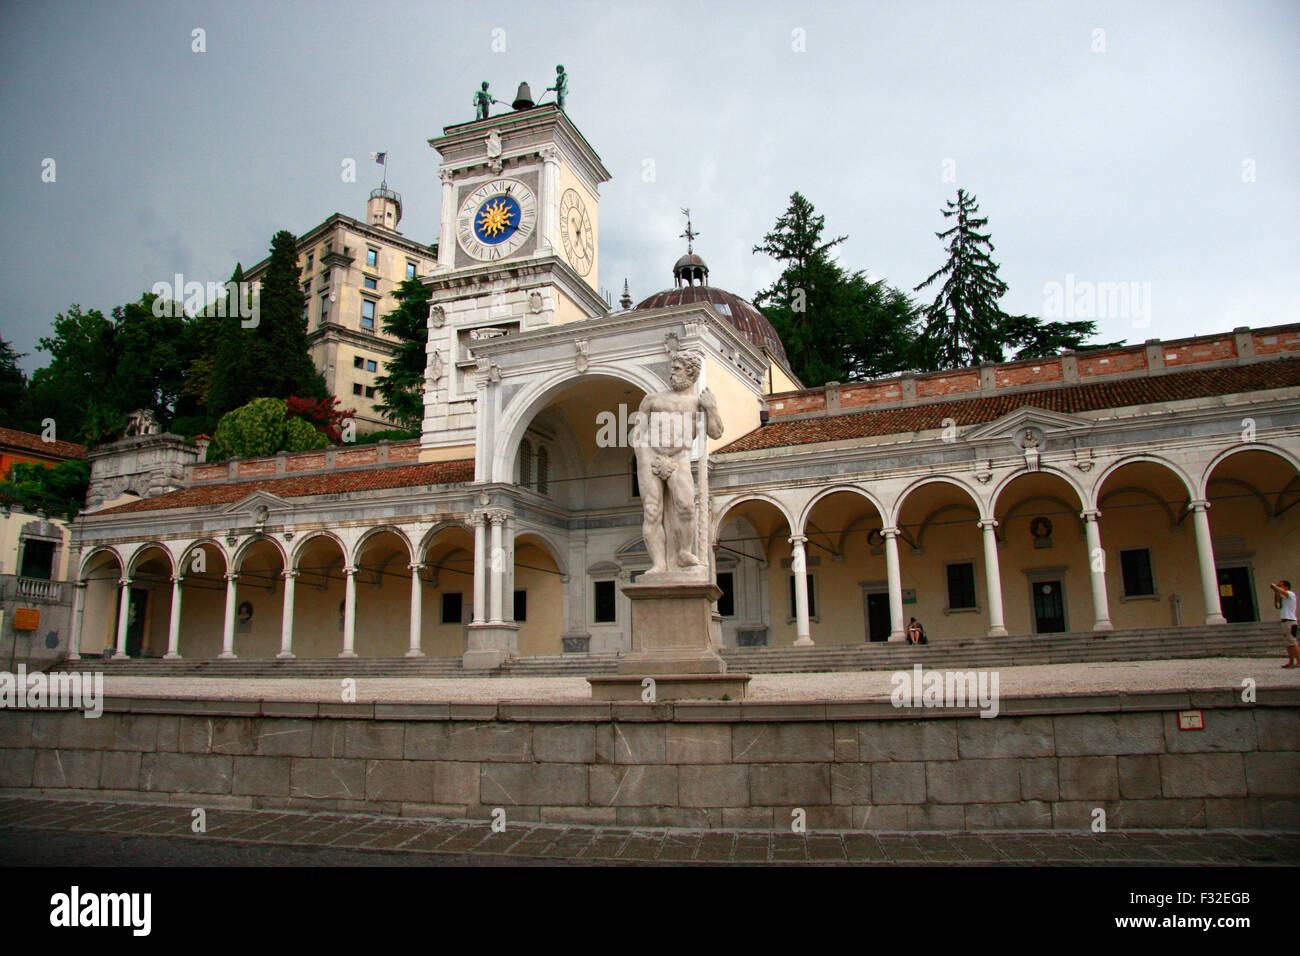 Piazza Liberta - Udine, Italien. - Stock Image